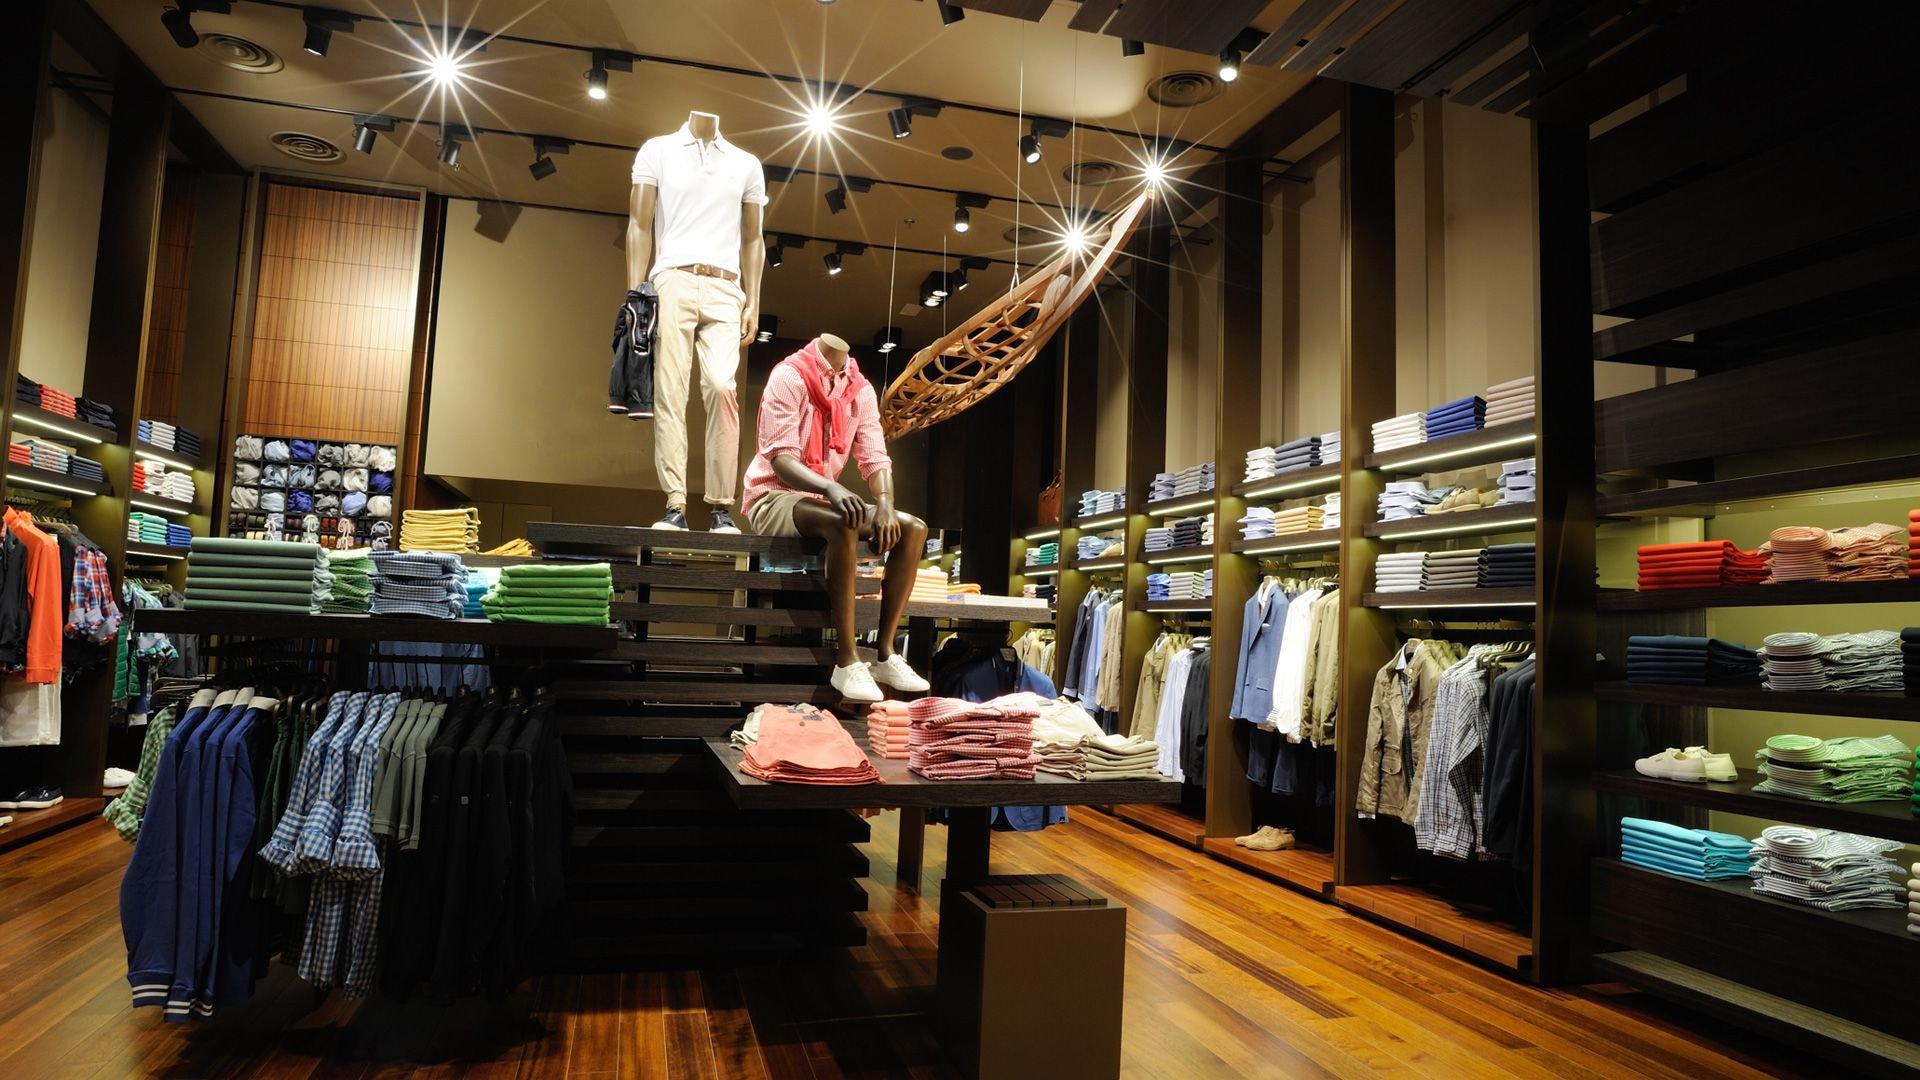 Canariasen tiendas deMontaje